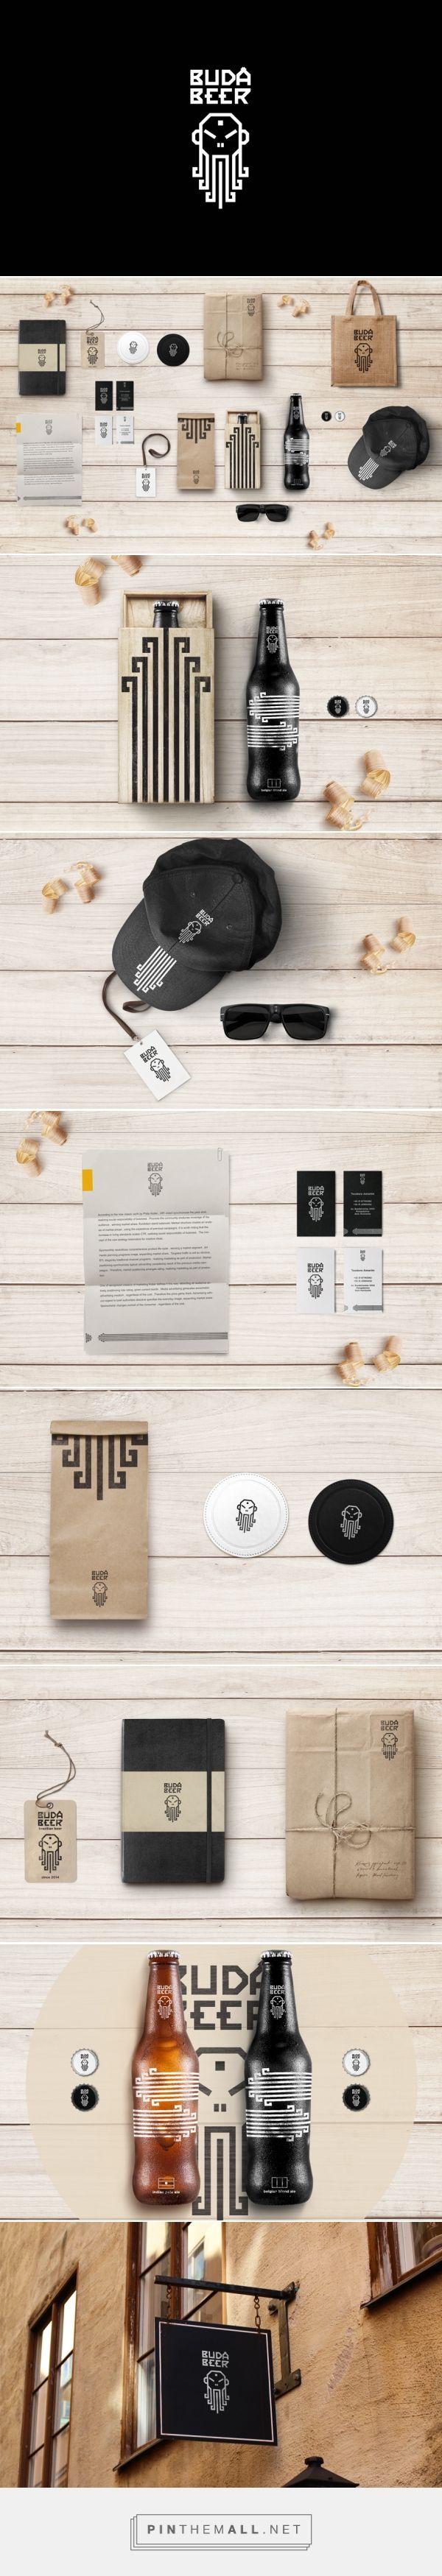 Buda Beer Bottles - Packaging of the World - Creative Package Design Gallery - http://www.packagingoftheworld.com/2016/10/buda-beer.html